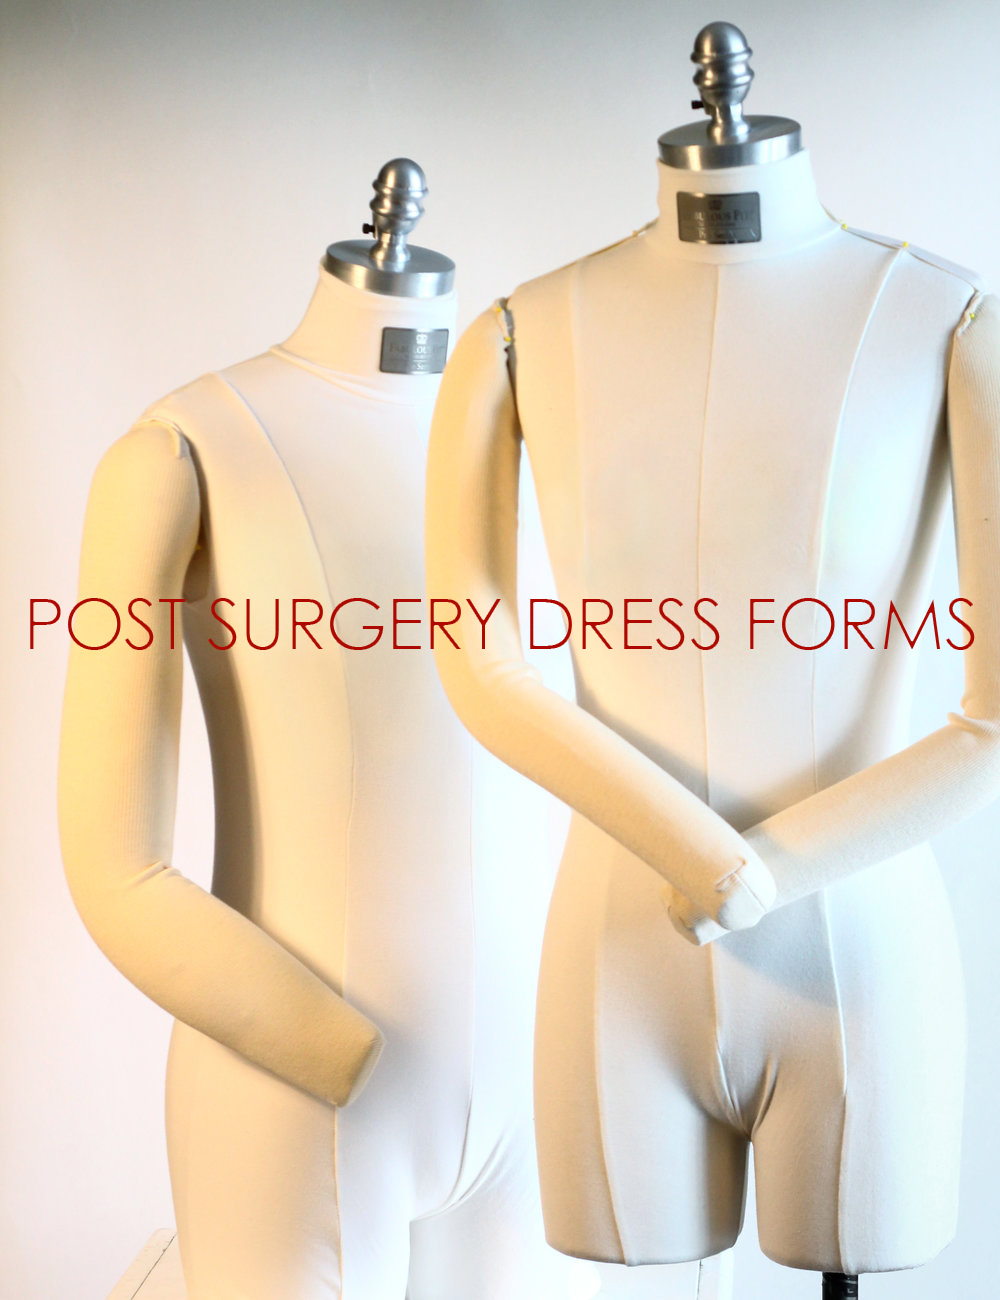 POST SUREGERY DRESS FORMS FORMAILCHIMP.jpg